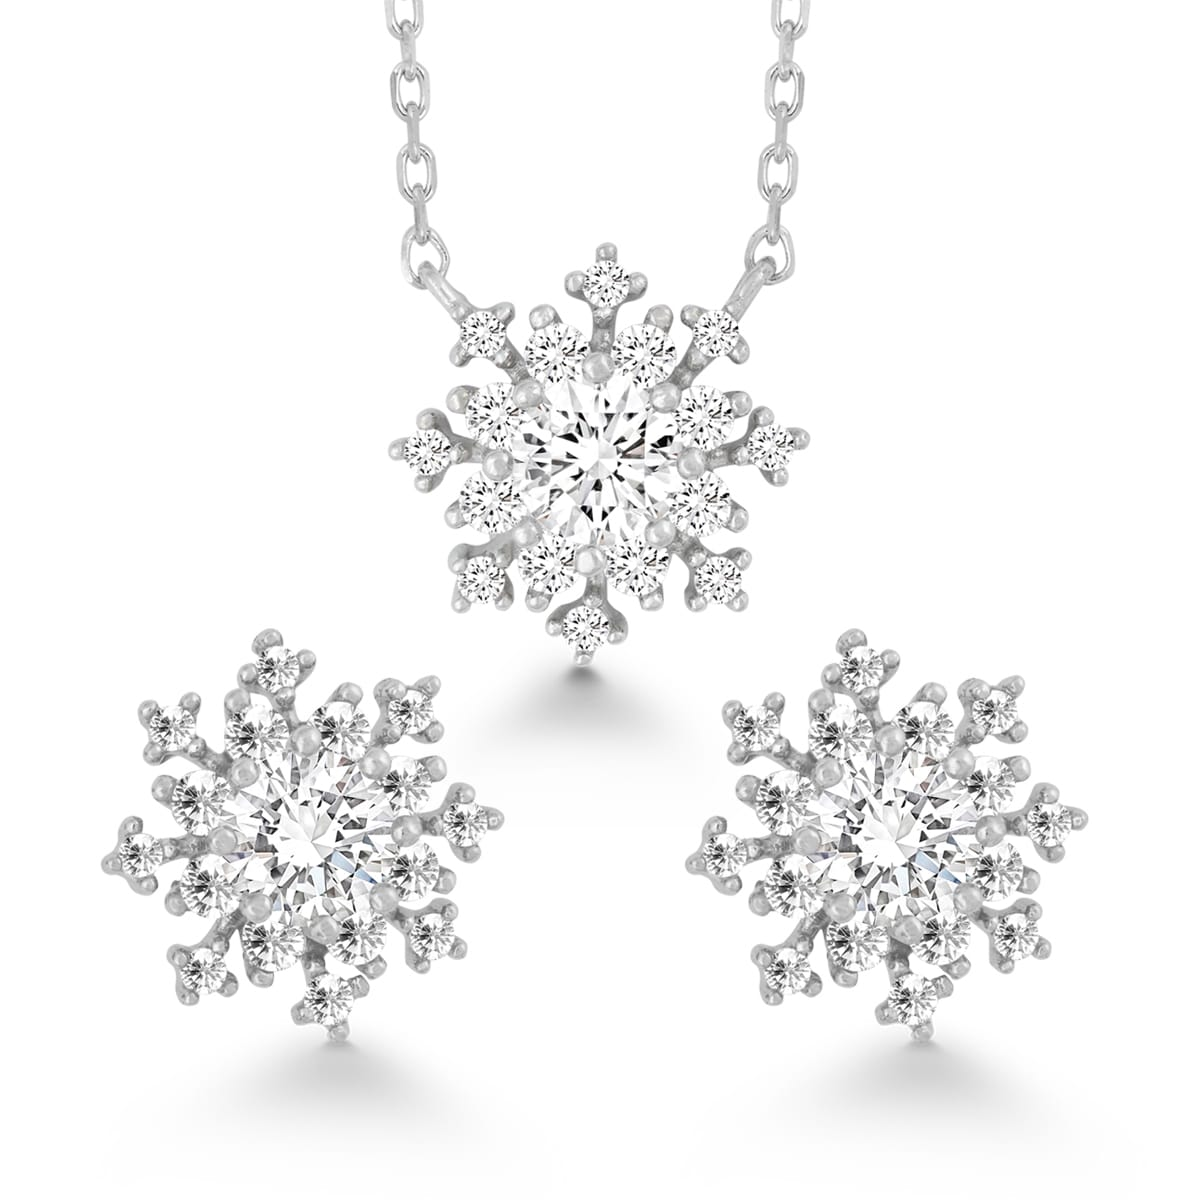 La Preciosa Sterling Silver Cubic Zirconia Snowflake Earr...